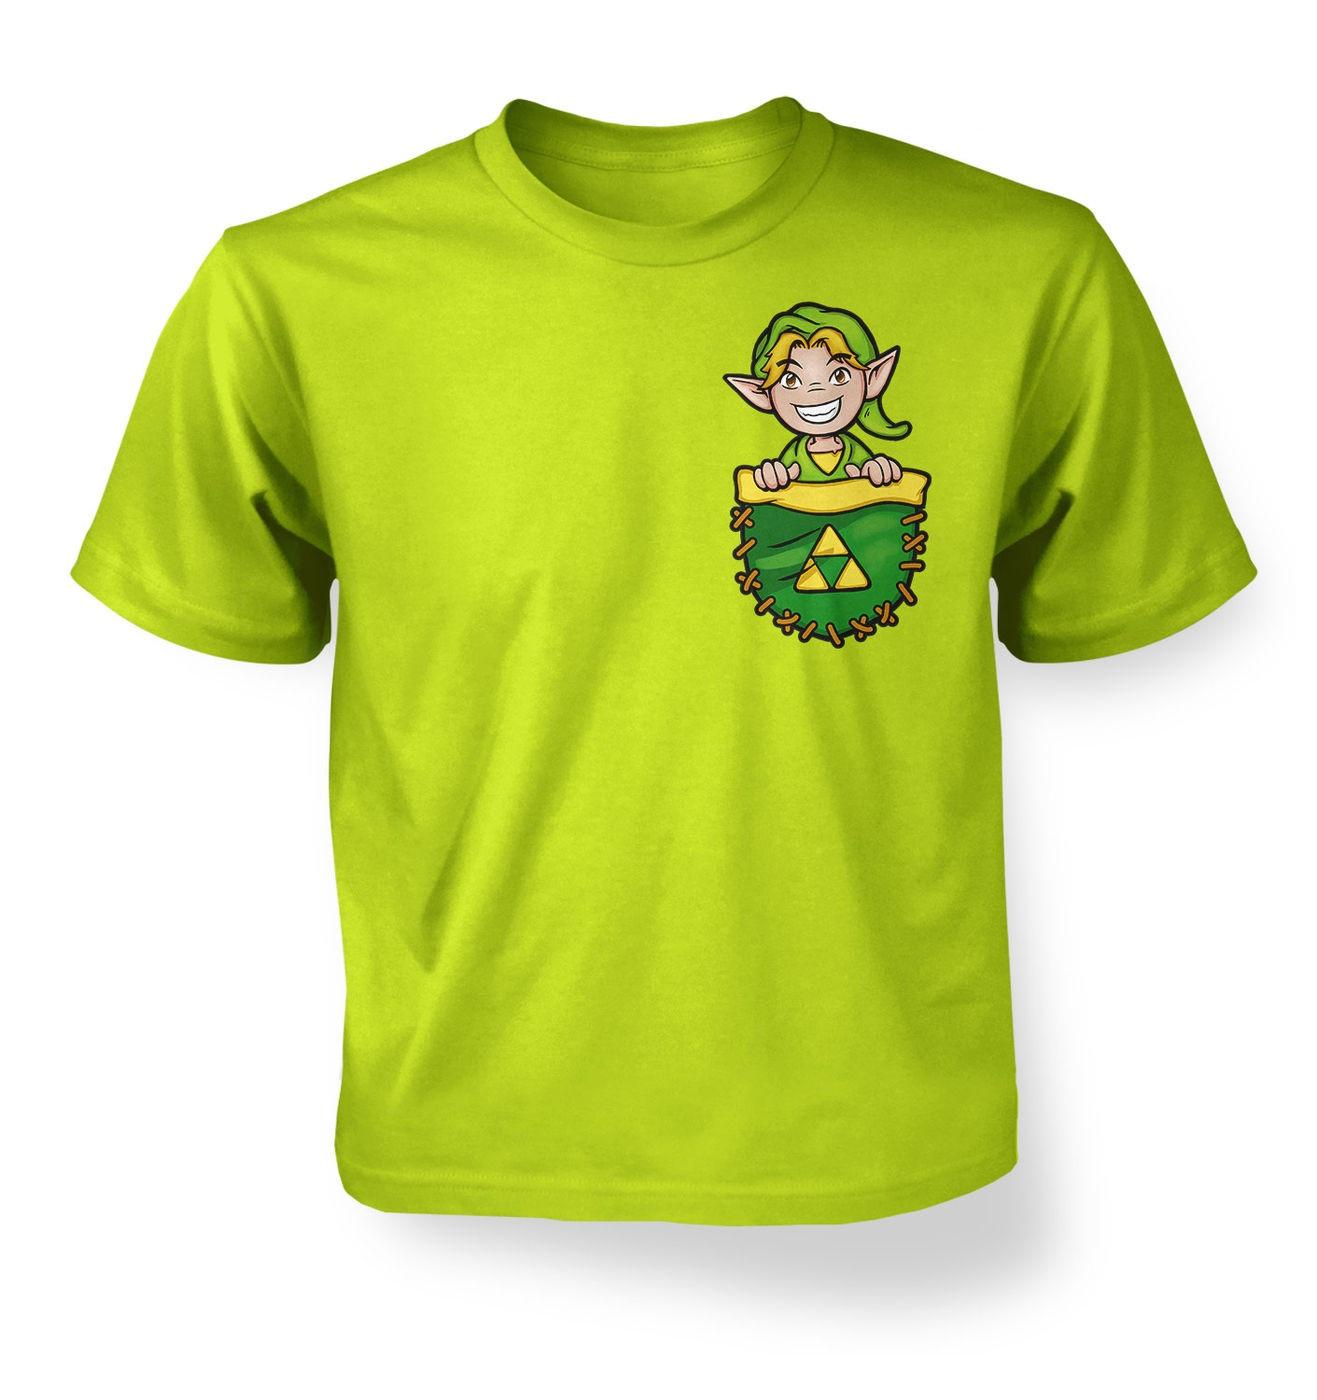 Pocket Hyrule Warrior kids t-shirt by Something Geeky